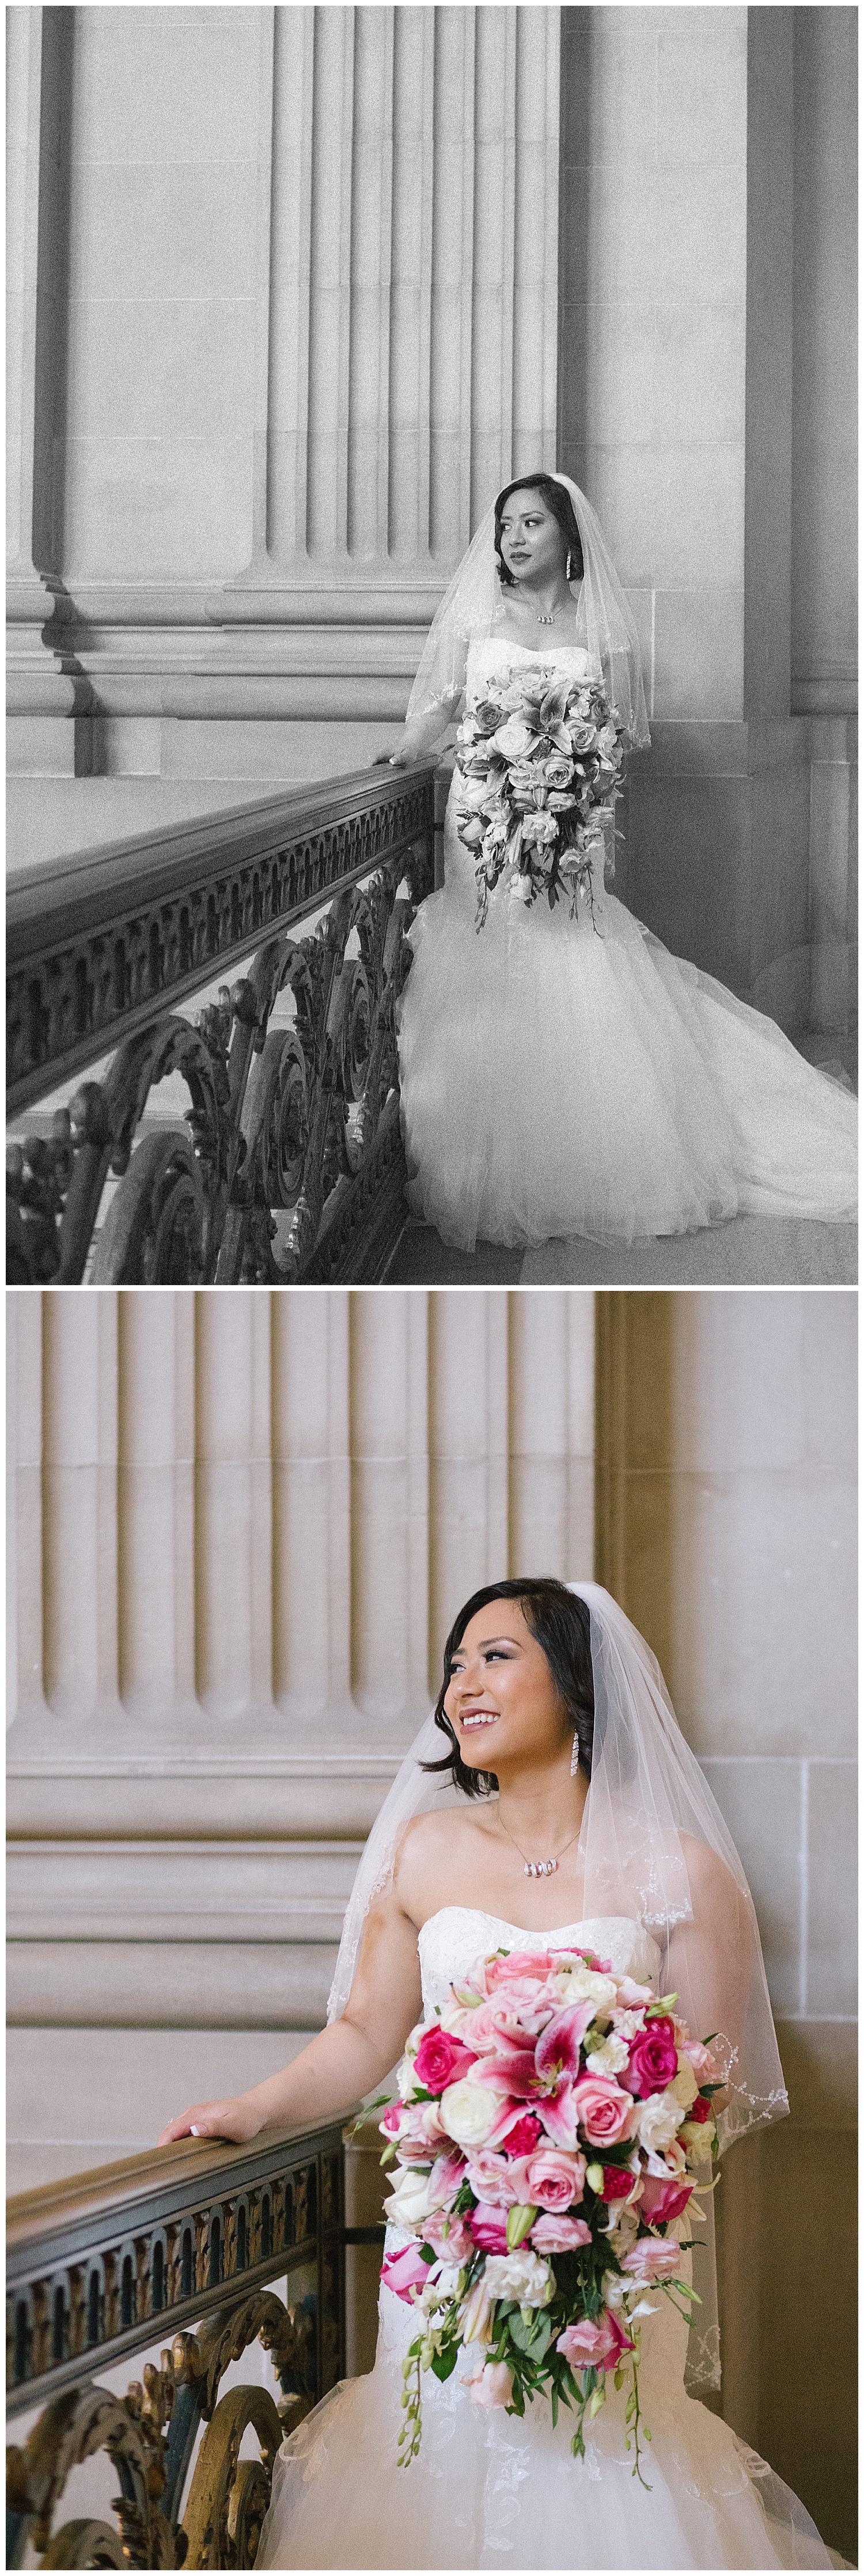 khariza-rae-photography-bay-area-wedding-photographer_0104.jpg